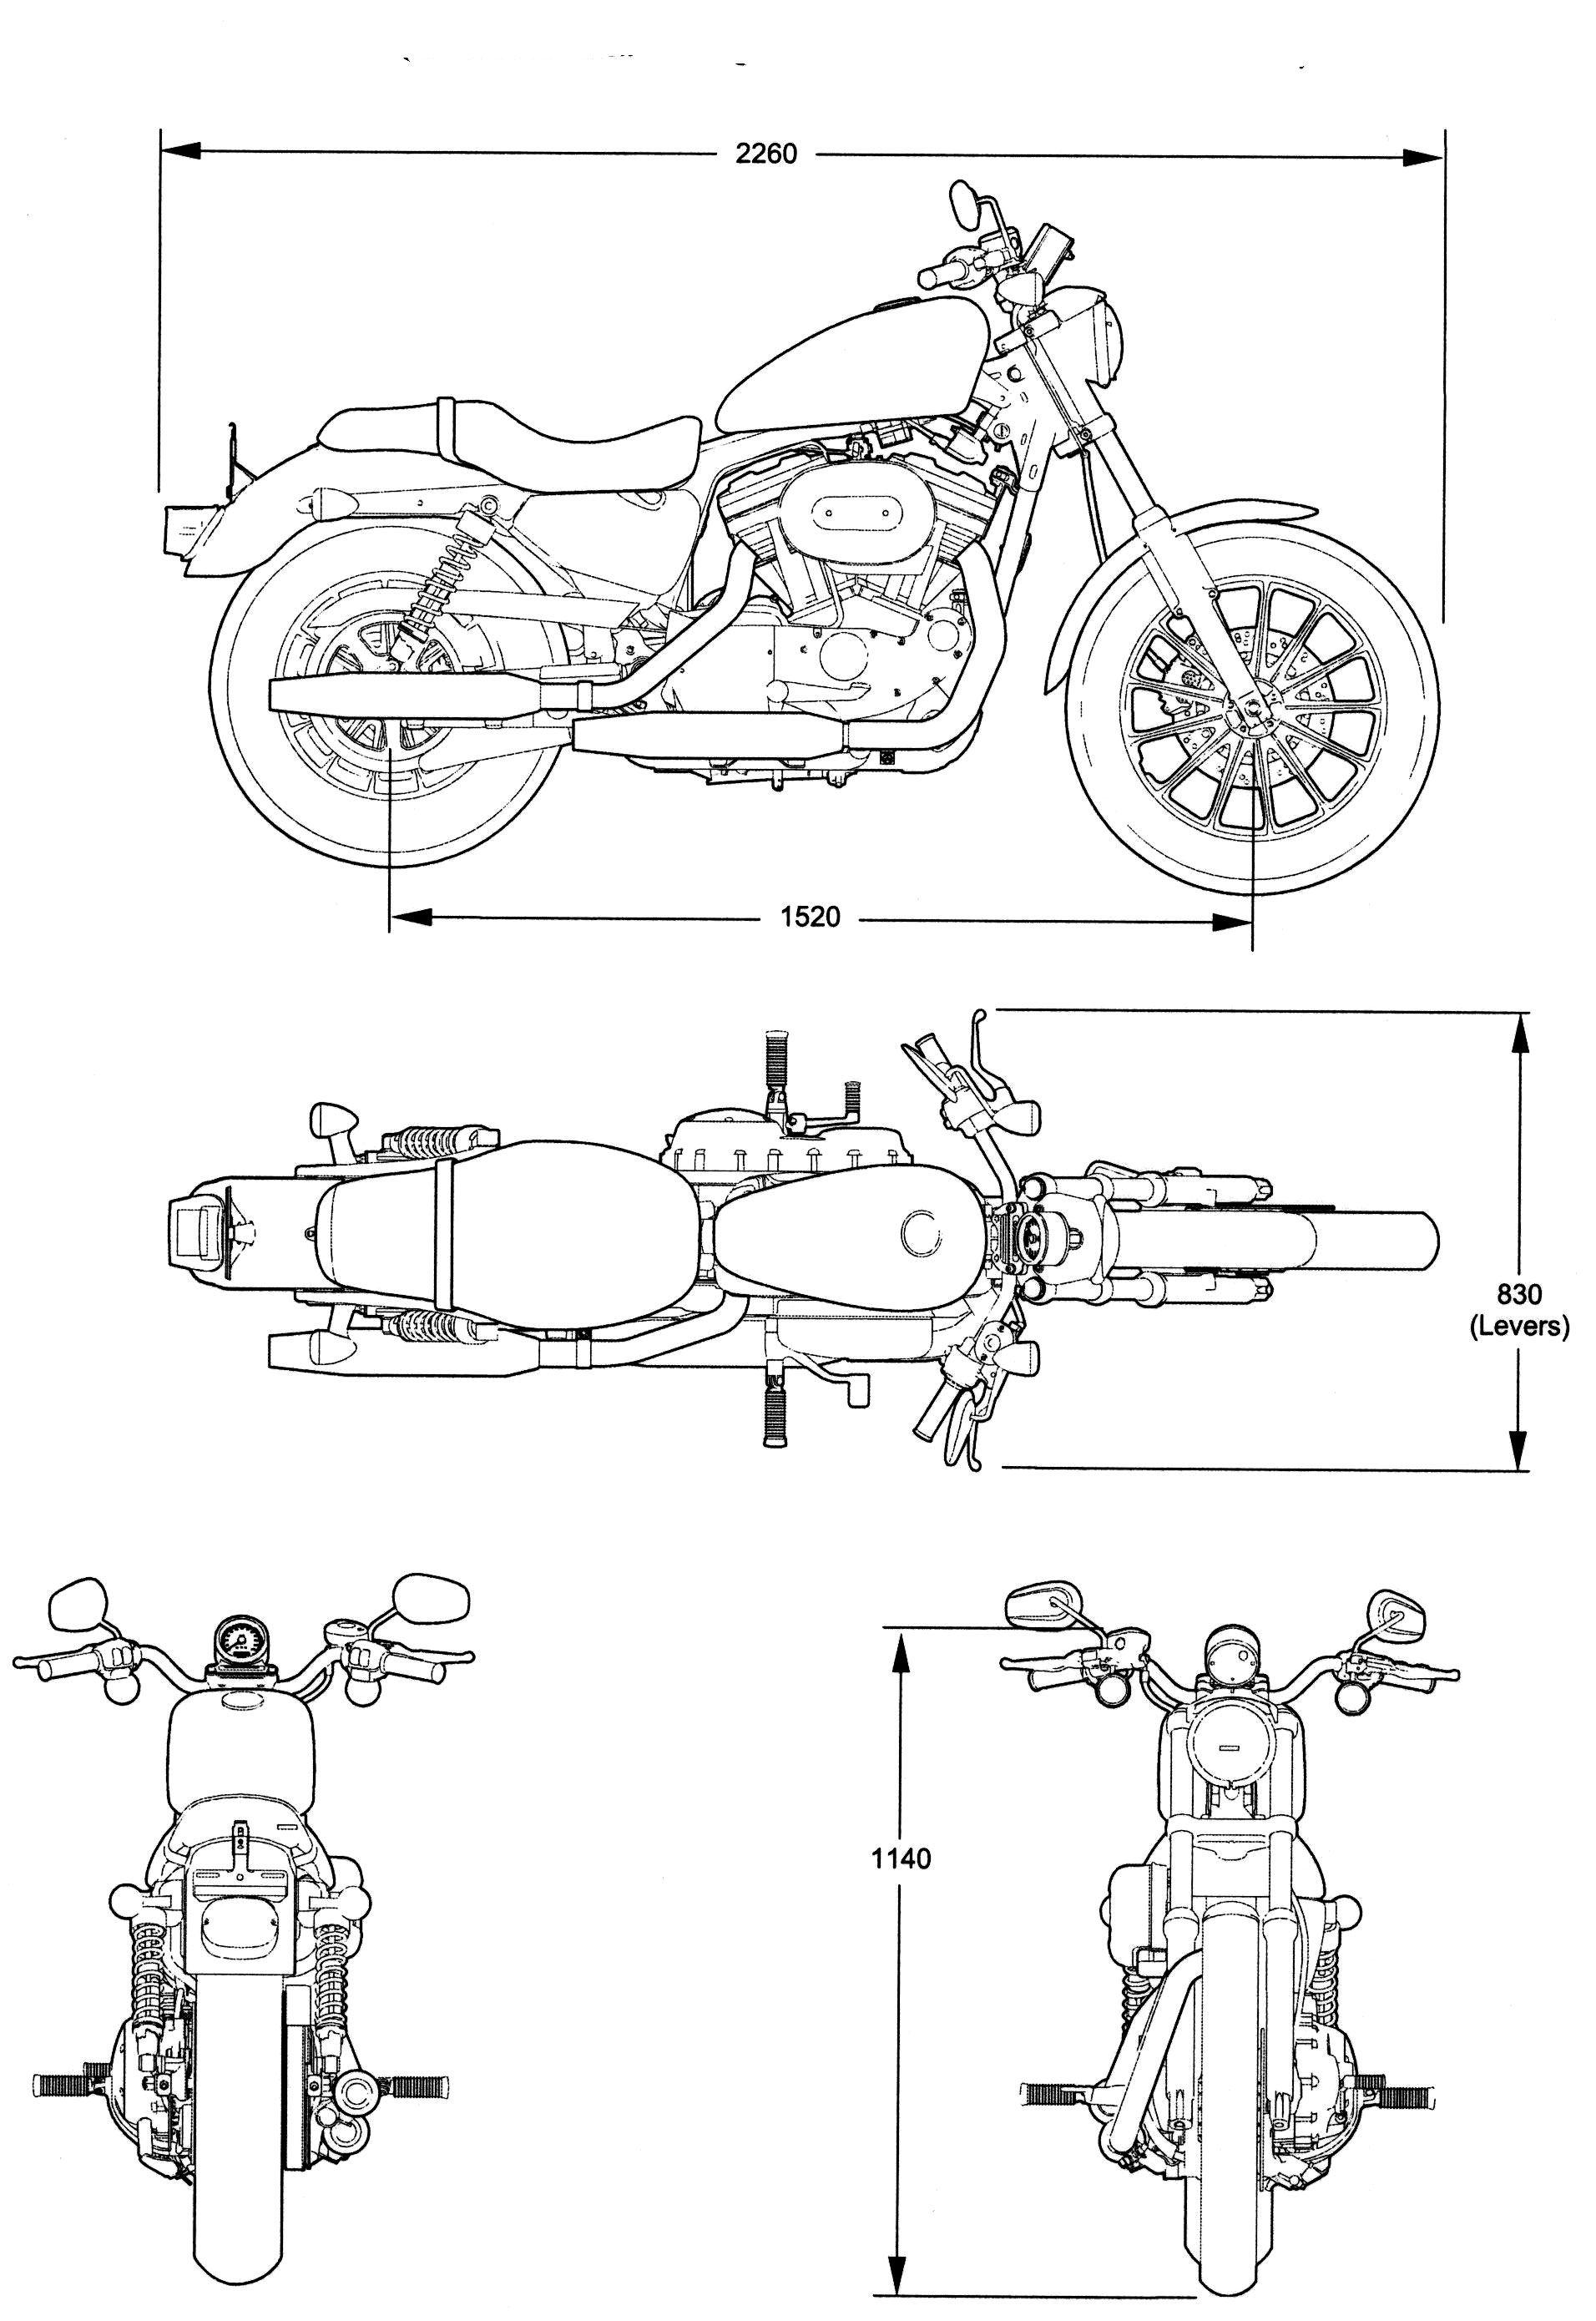 Harley Technical Drawings